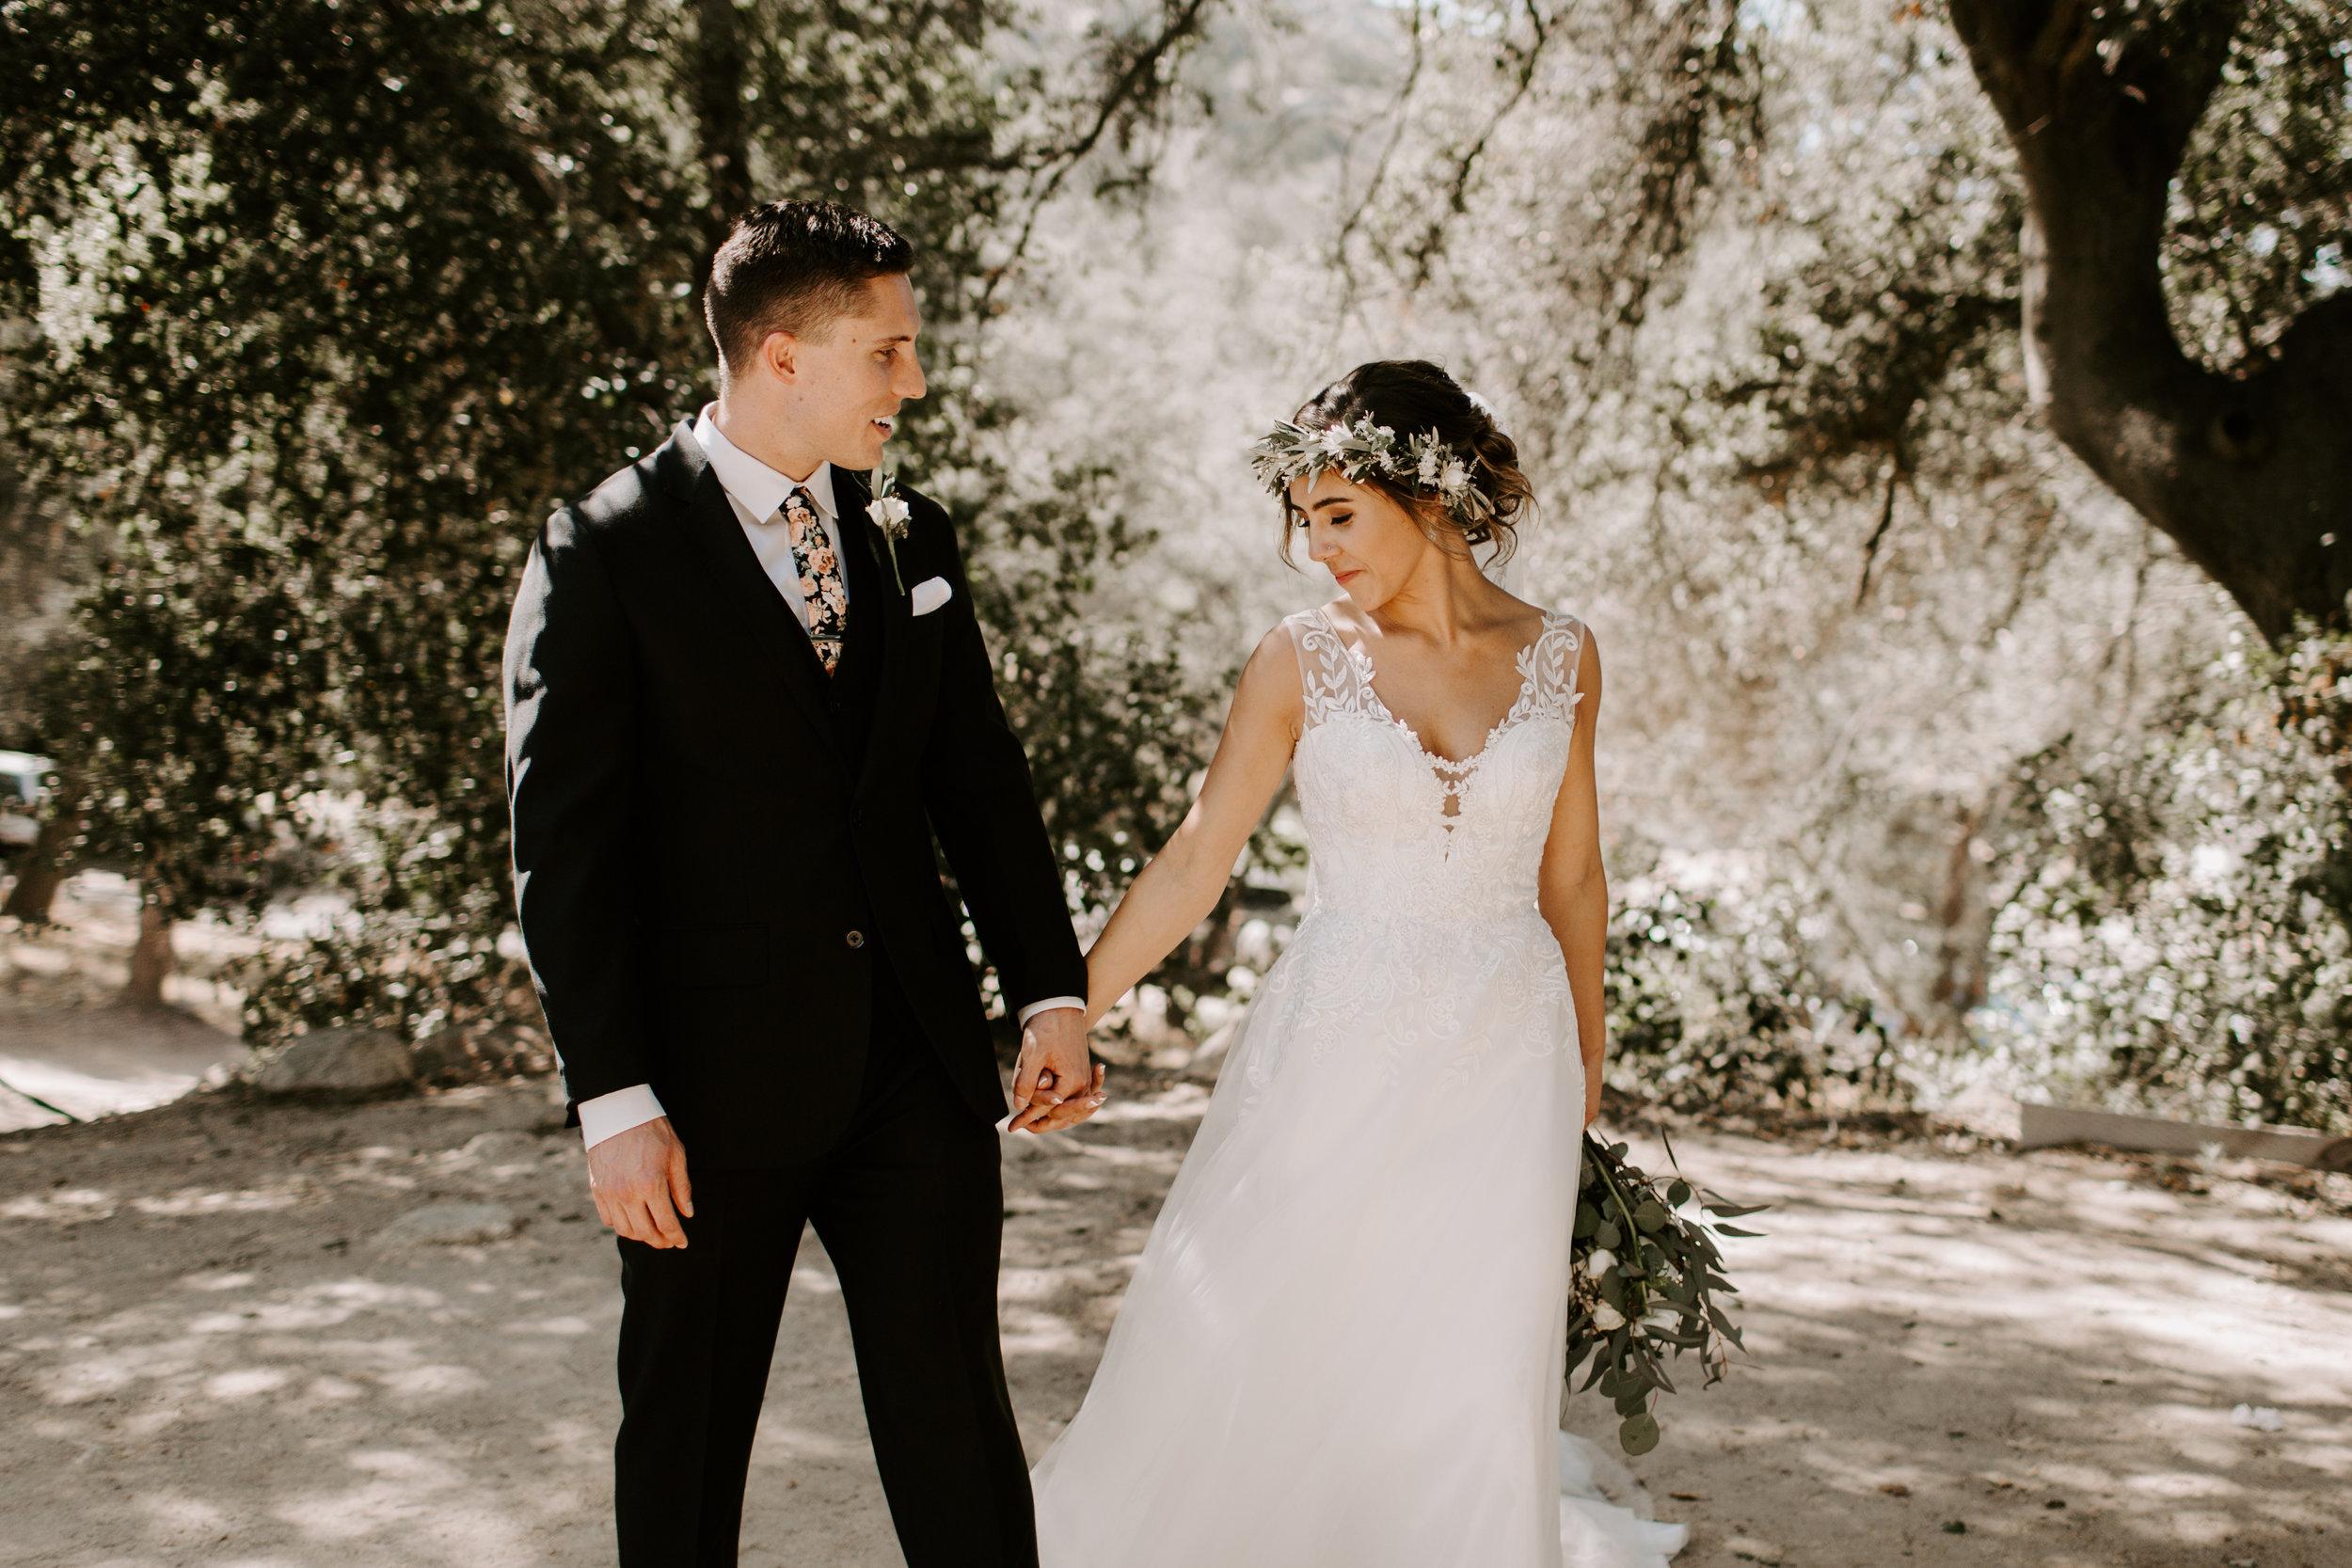 kate+zack_wedding_secludedgardenestate_temecula_madisonrylee_0592.jpg